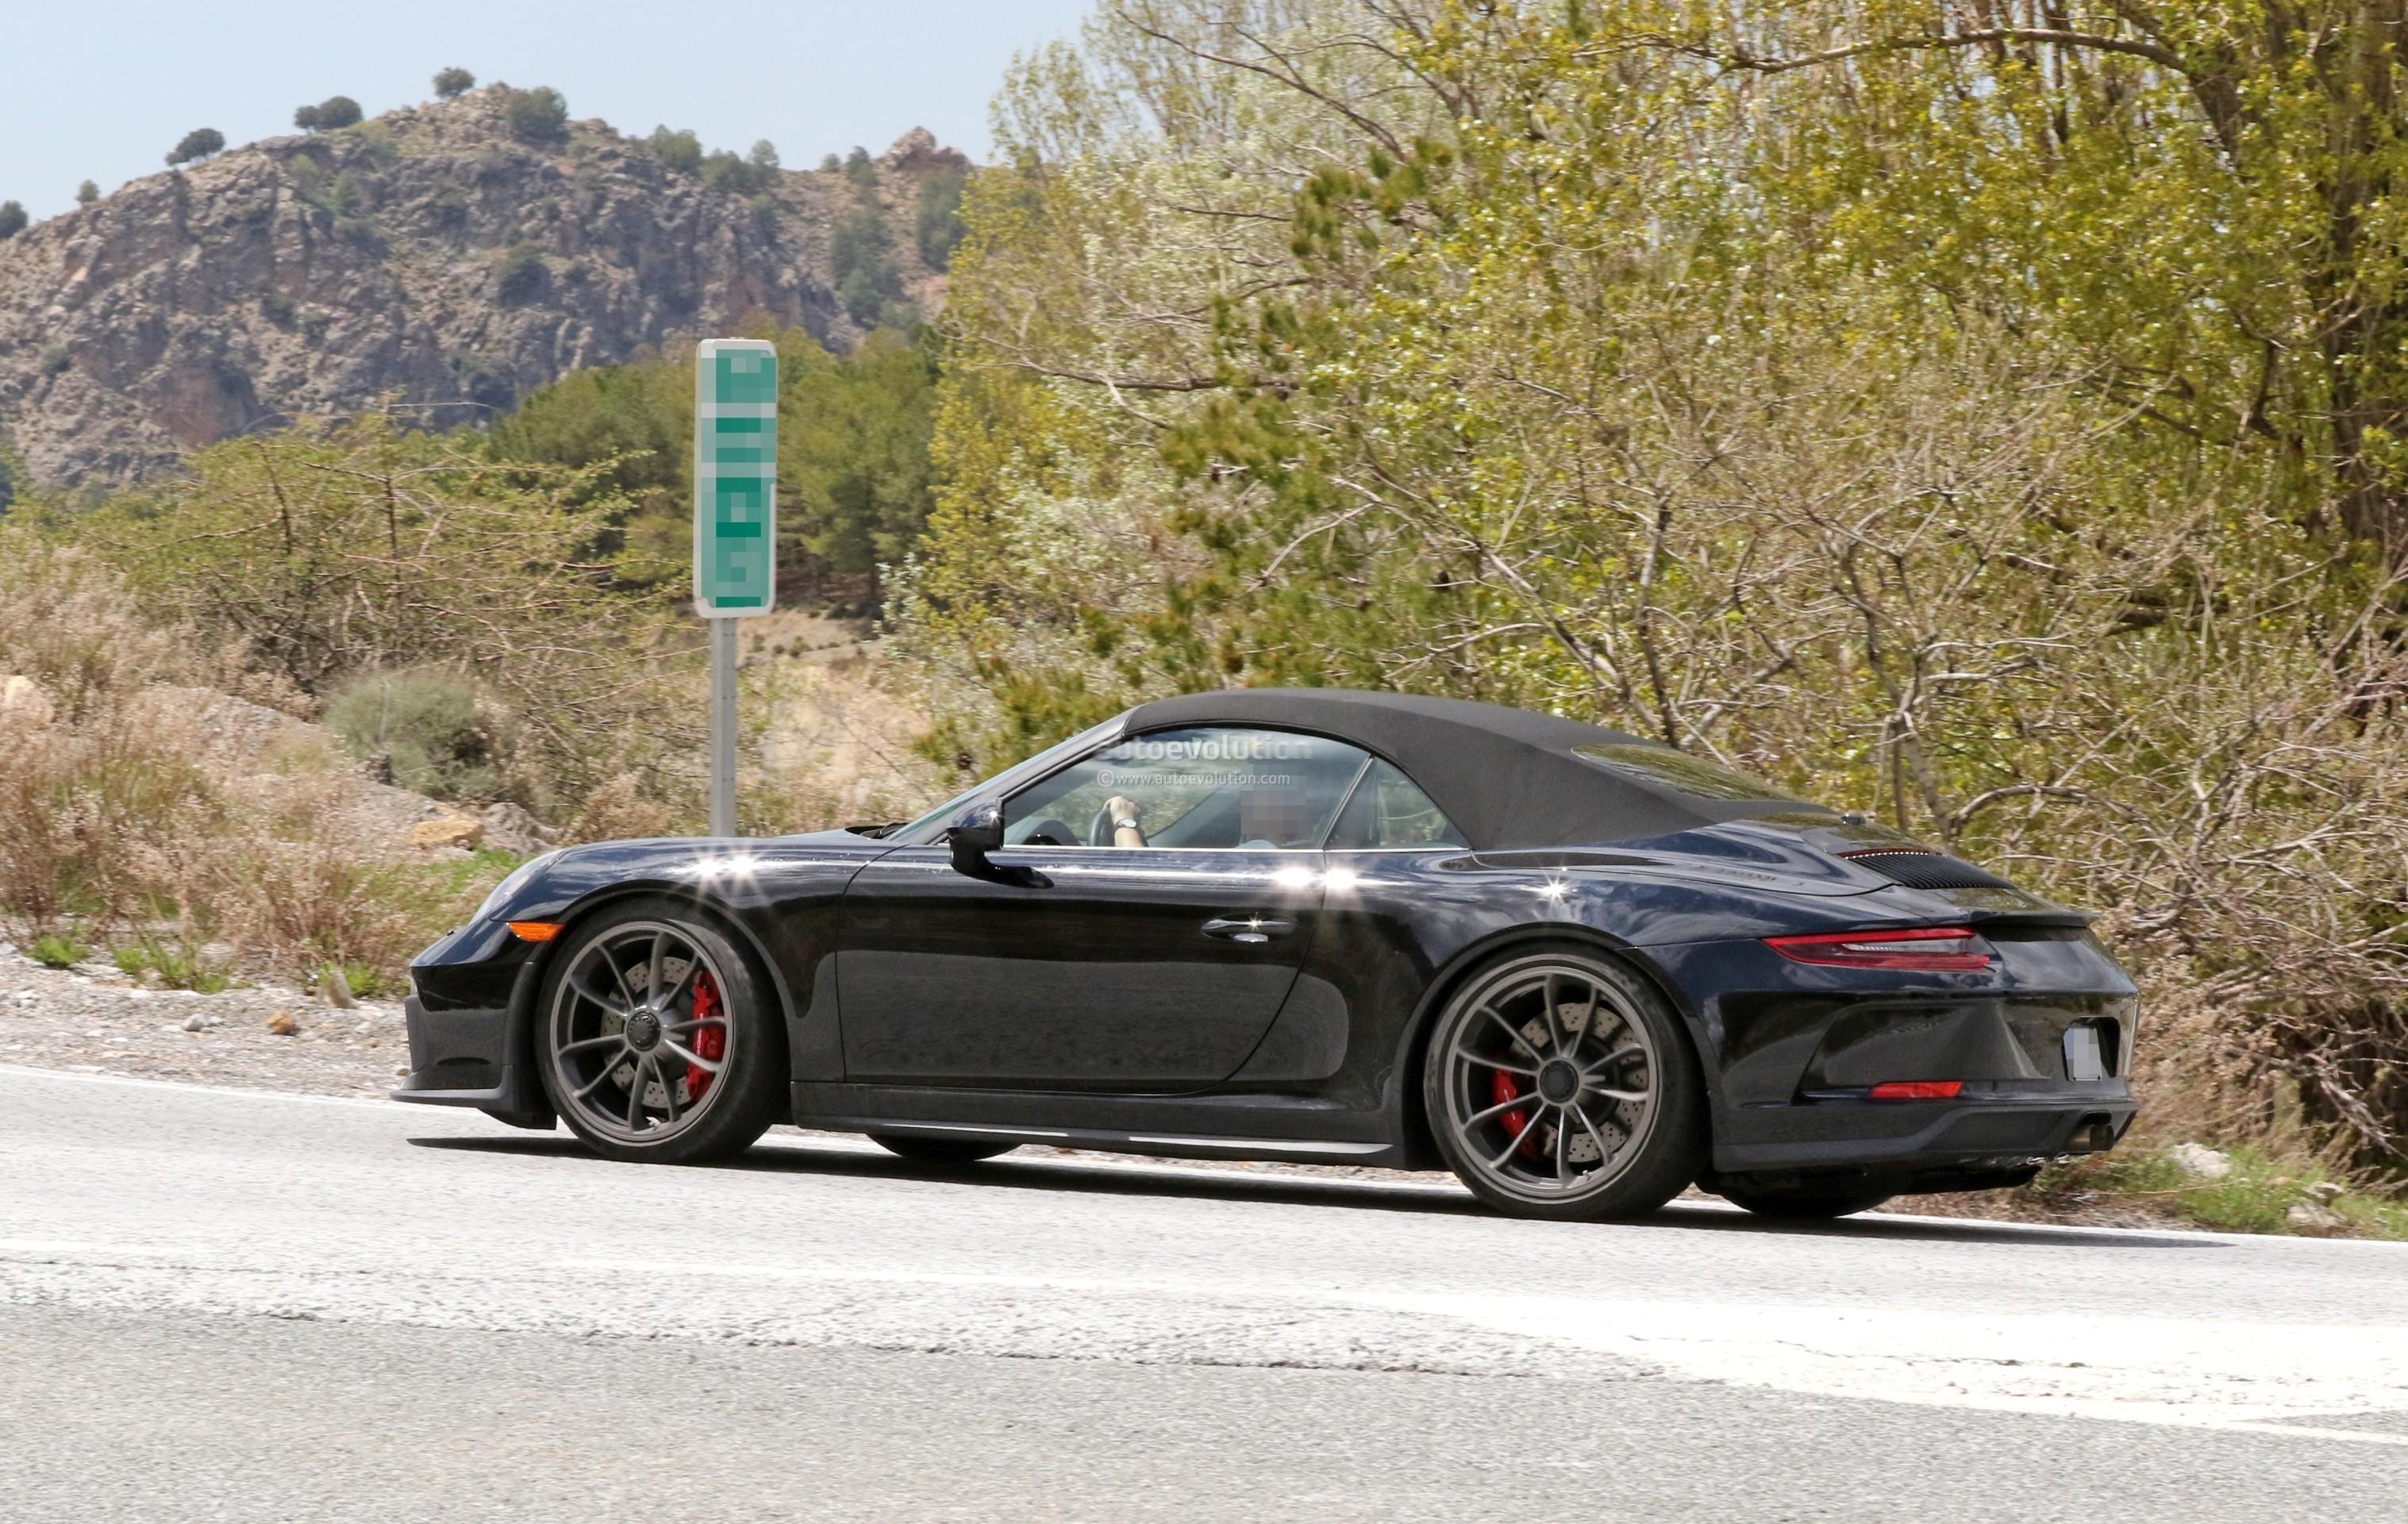 Spyshots Is This The 2019 Porsche 911 Gt3 Touring